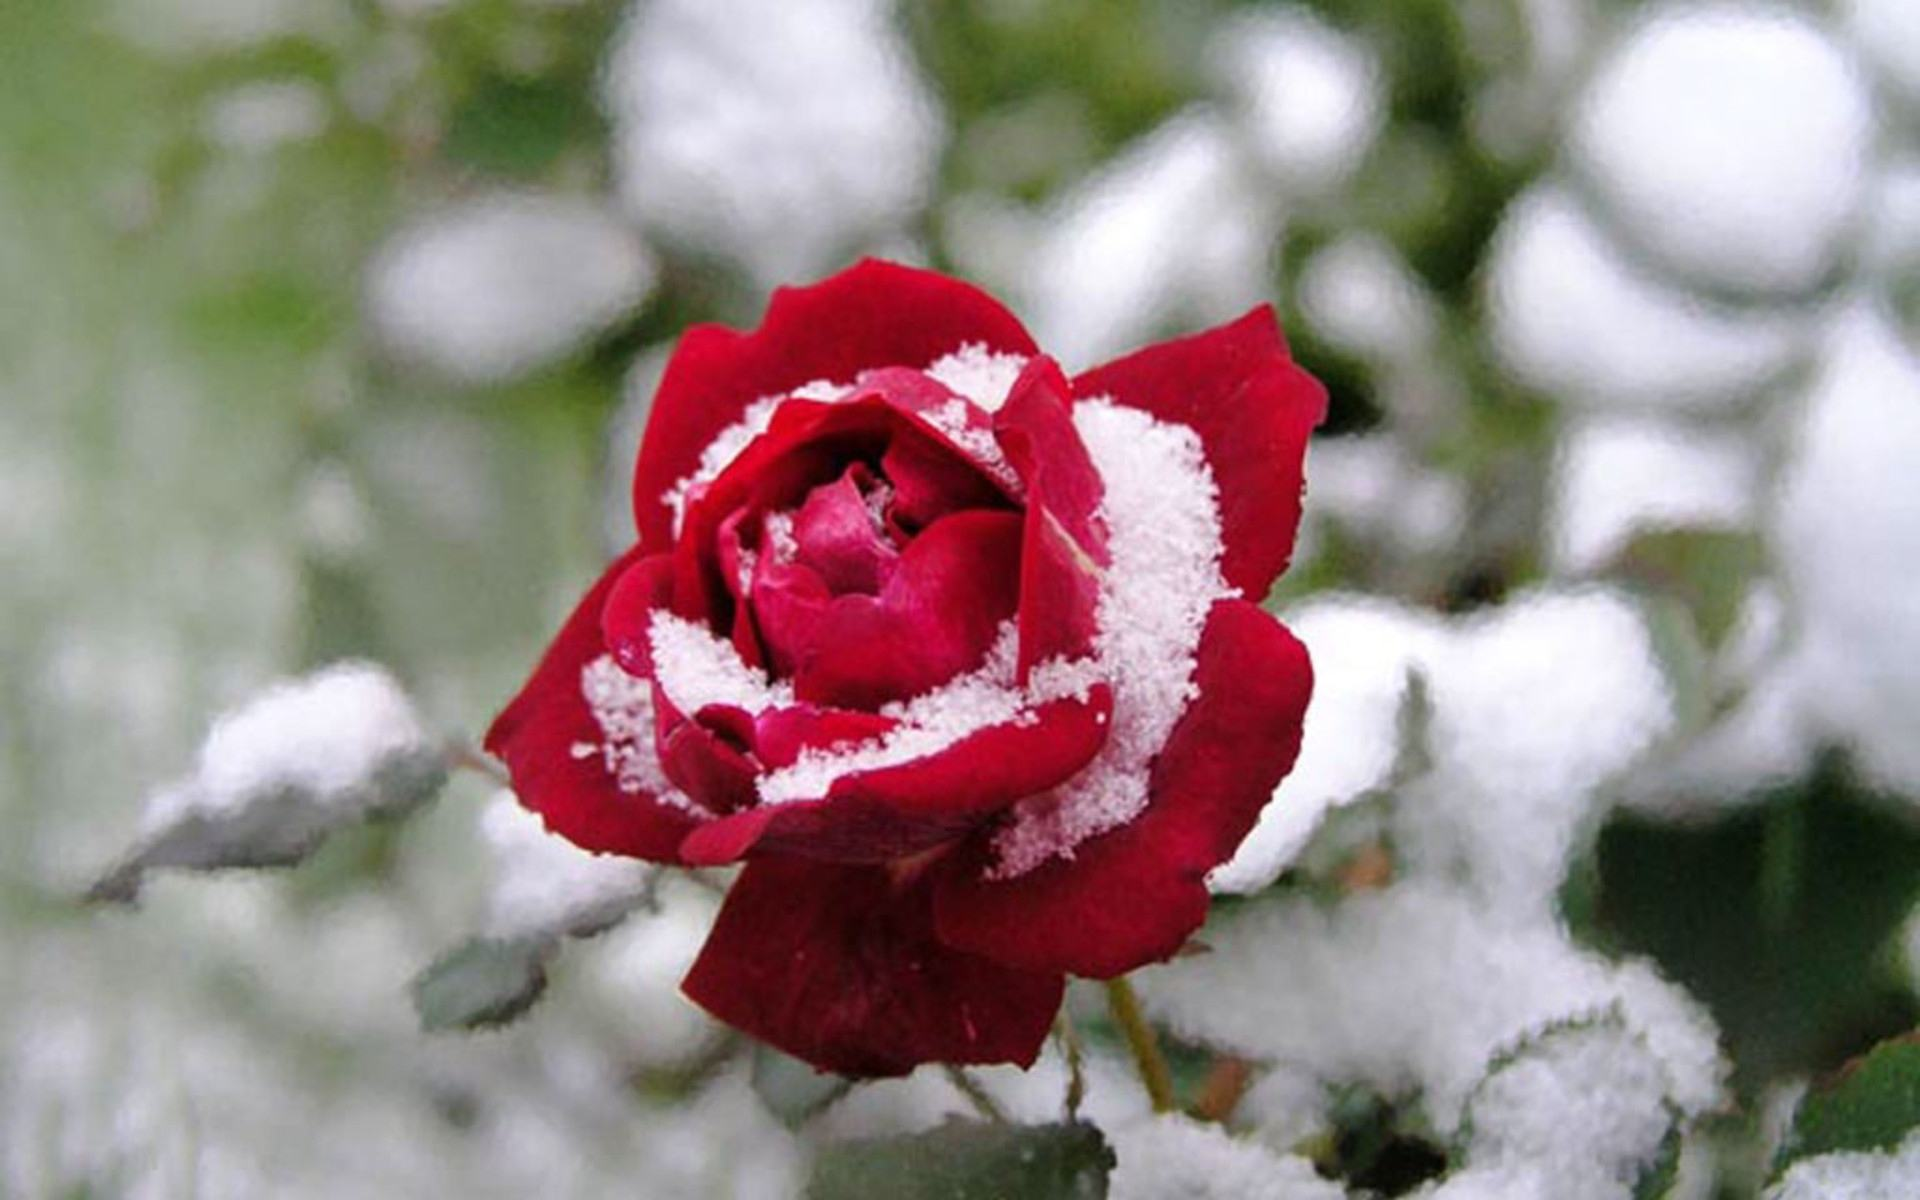 http://hq-oboi.ru/photo/roza_pod_snegom_1920x1200.jpg